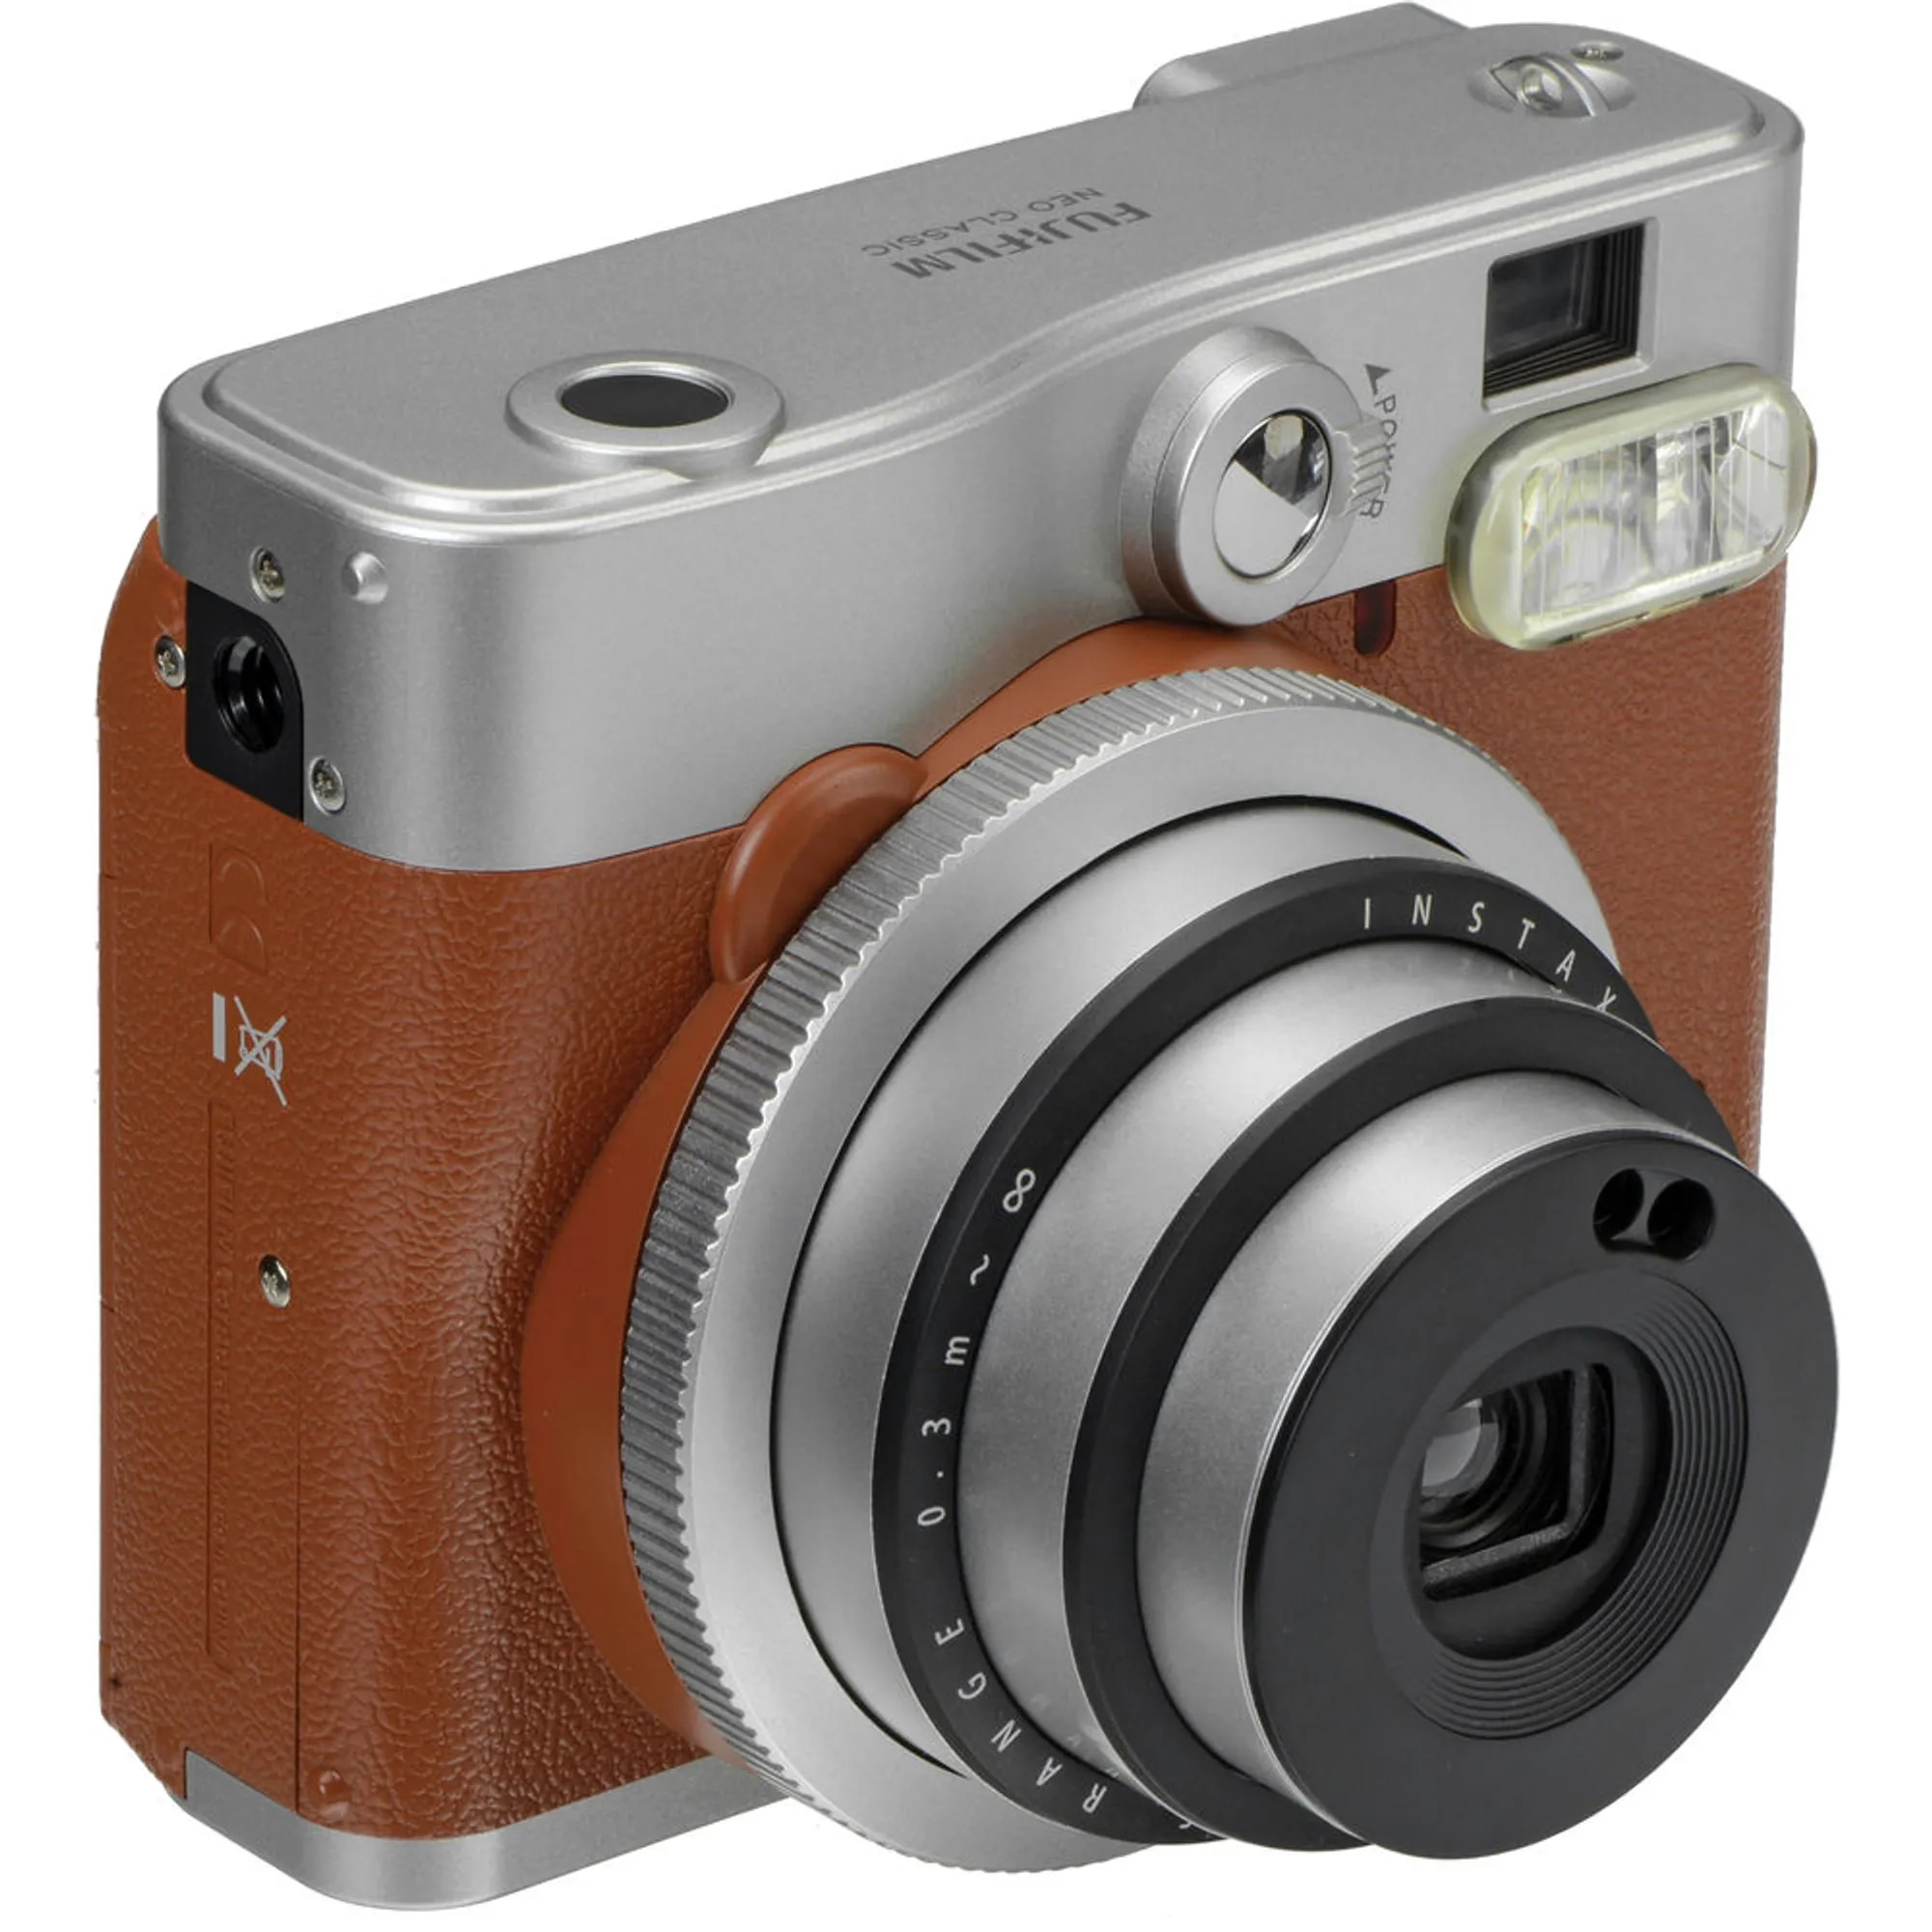 Fotografie Camera foto instant Fujifilm Instax mini 90, Brown